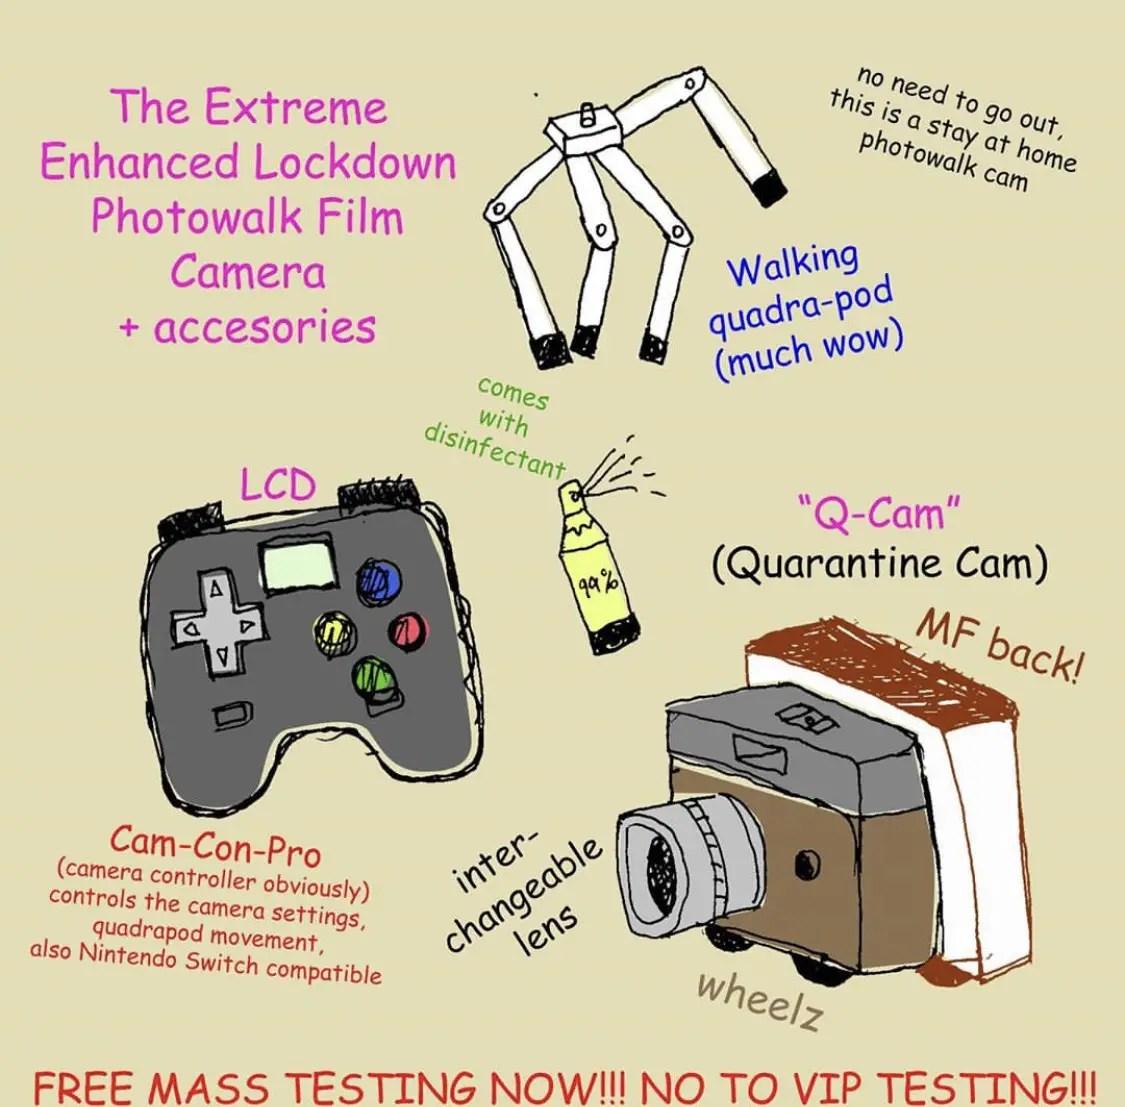 Extreme Enhanced Lockdown Photowalk Film Camera by Teo Esguerra